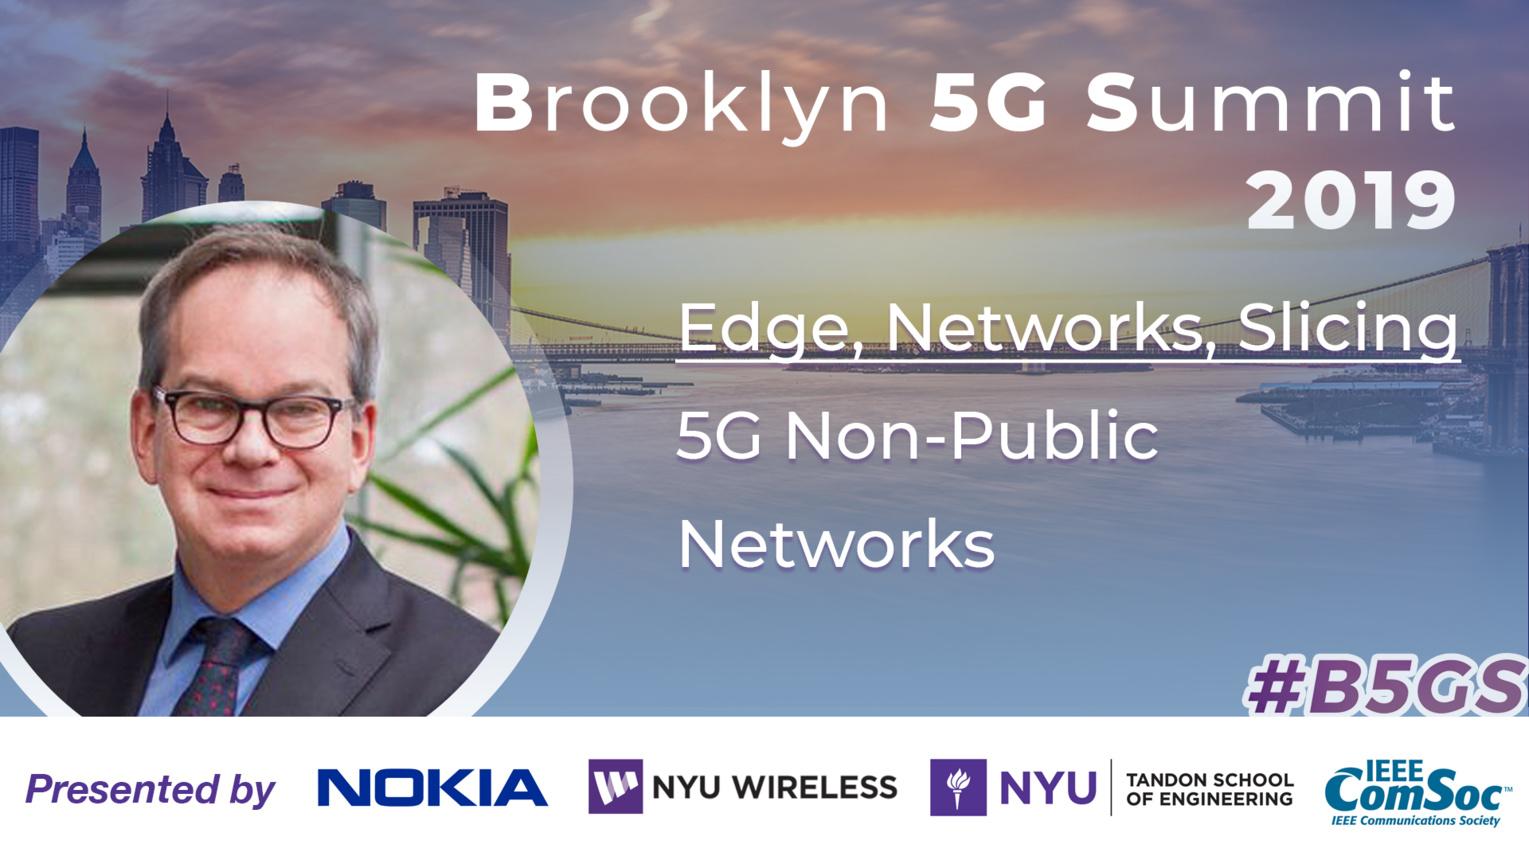 5G Non-Public Networks: Edge, Networks & Slicing - Hans Schotten - B5GS 2019